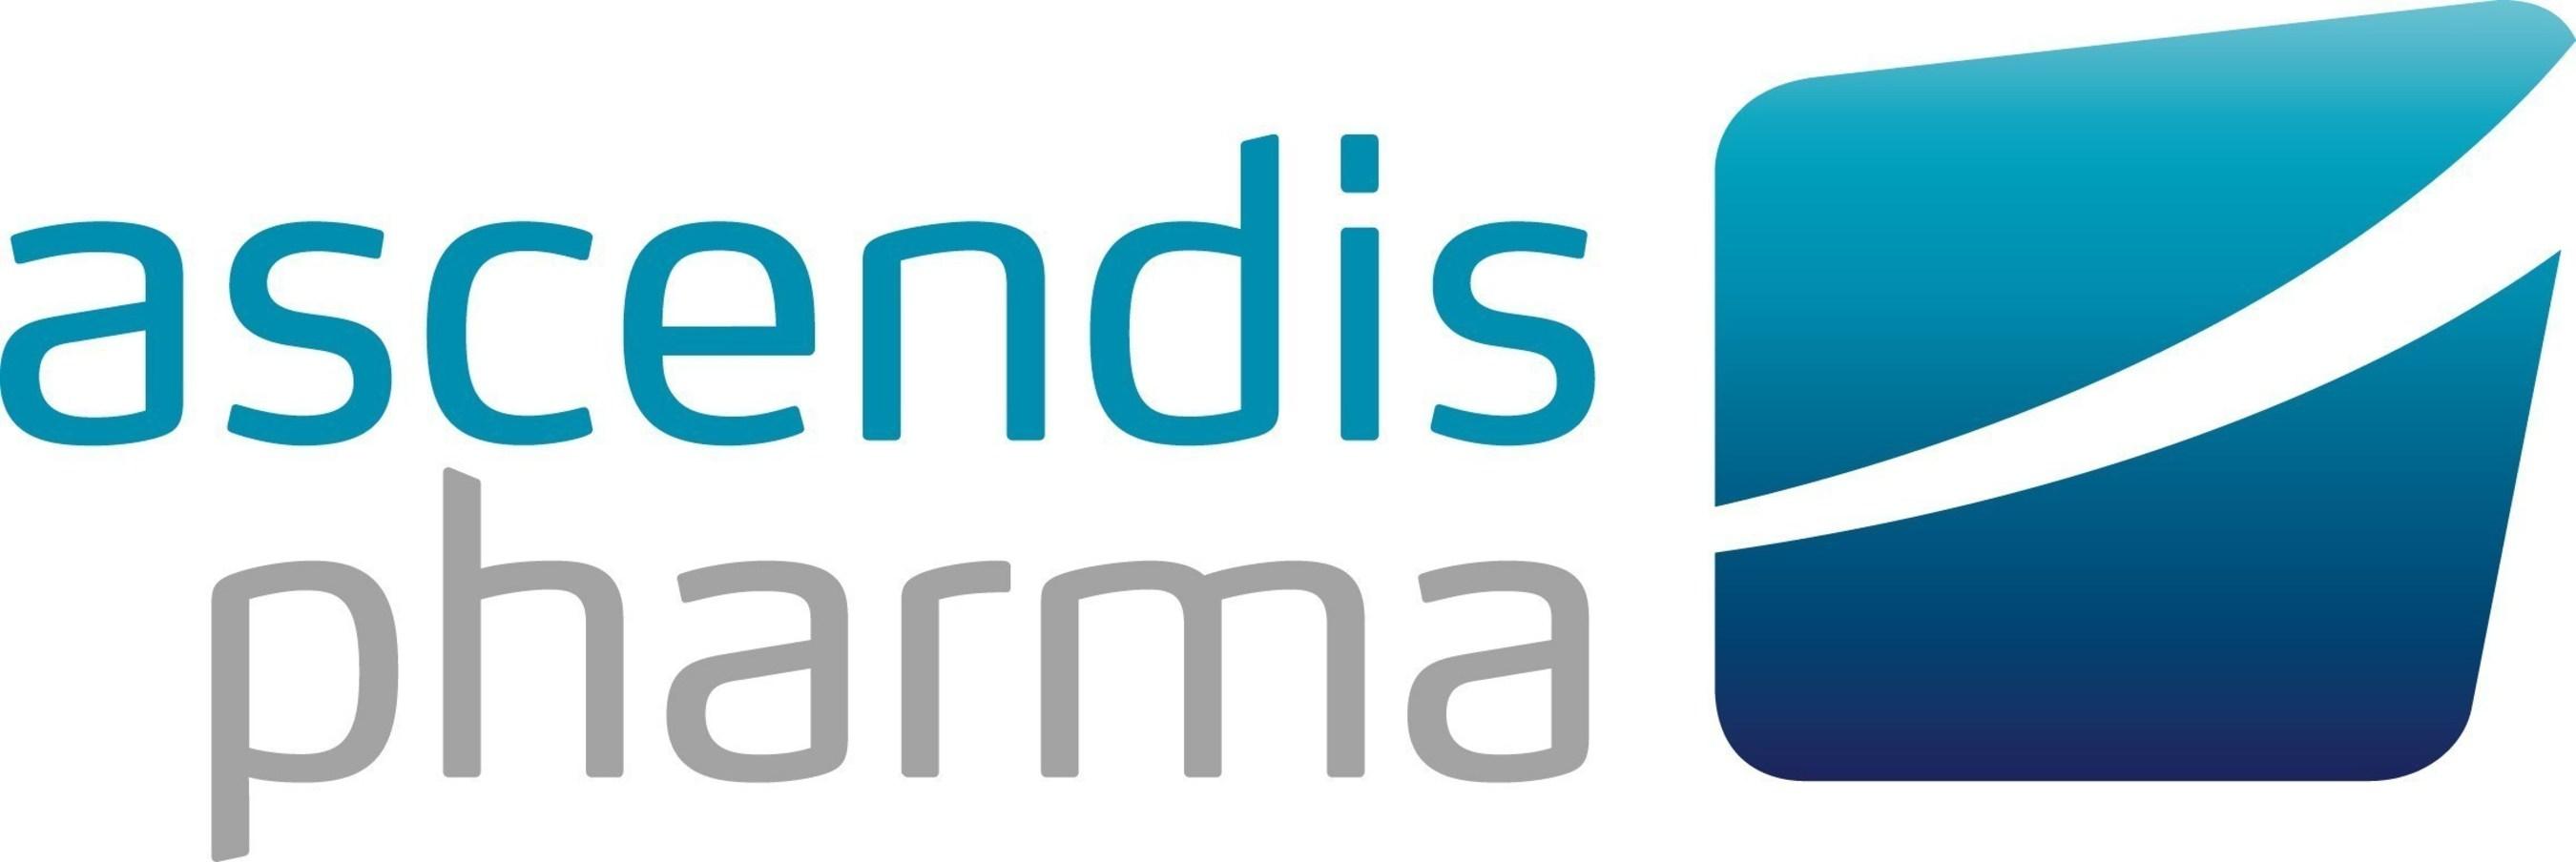 Ascendis Pharma logo